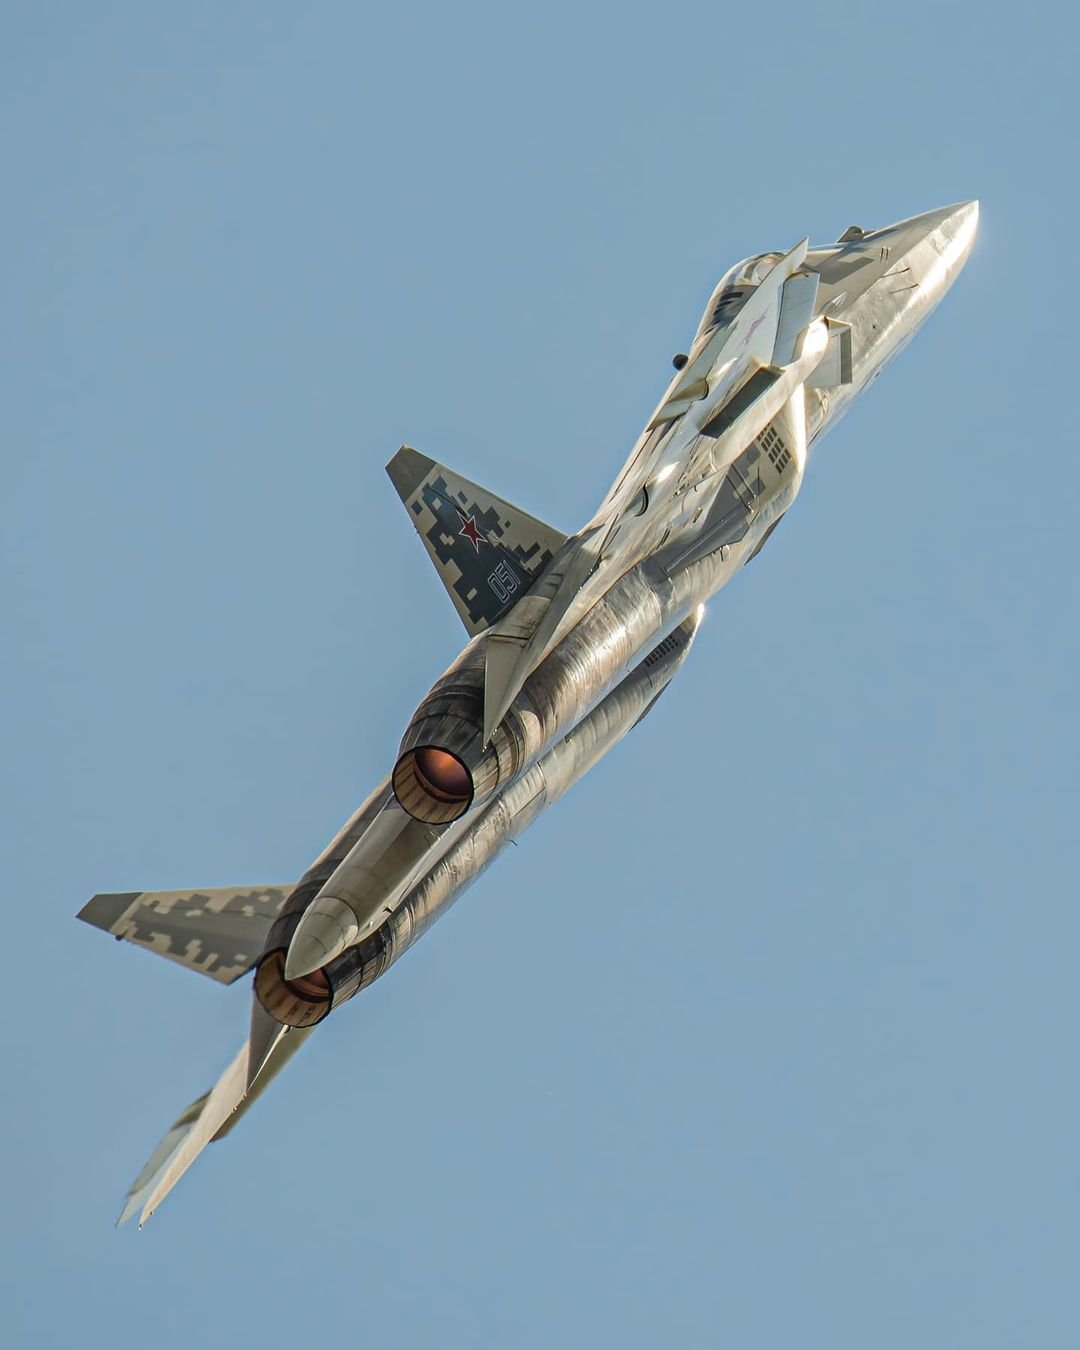 Su-57 Stealth Fighter: News #7 - Page 33 E7ANj0IXoAI0wcX?format=jpg&name=large